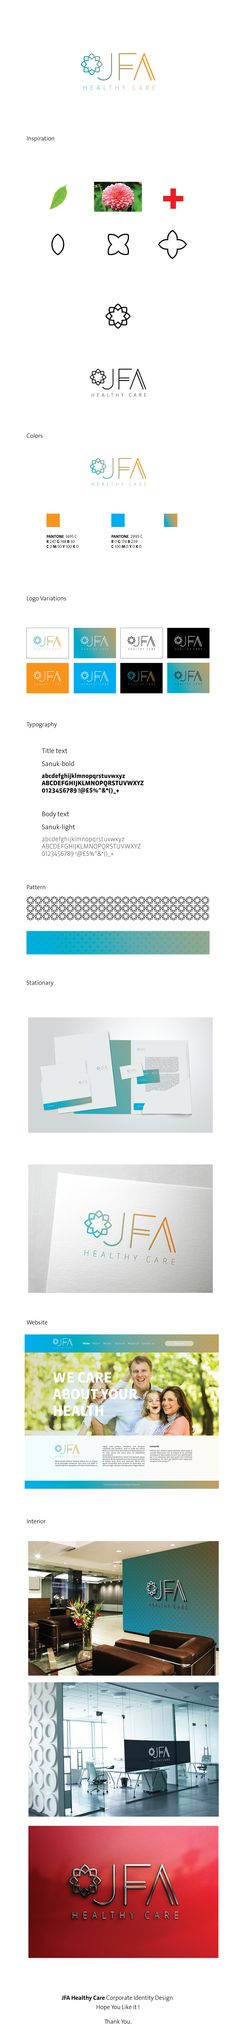 JFA Healthcare Design. Skincare Branding, Company Values, Spa Design, Reference Letter, Healthcare Design, Beauty Spa, Healthy People 2020, Deco, Climate Change